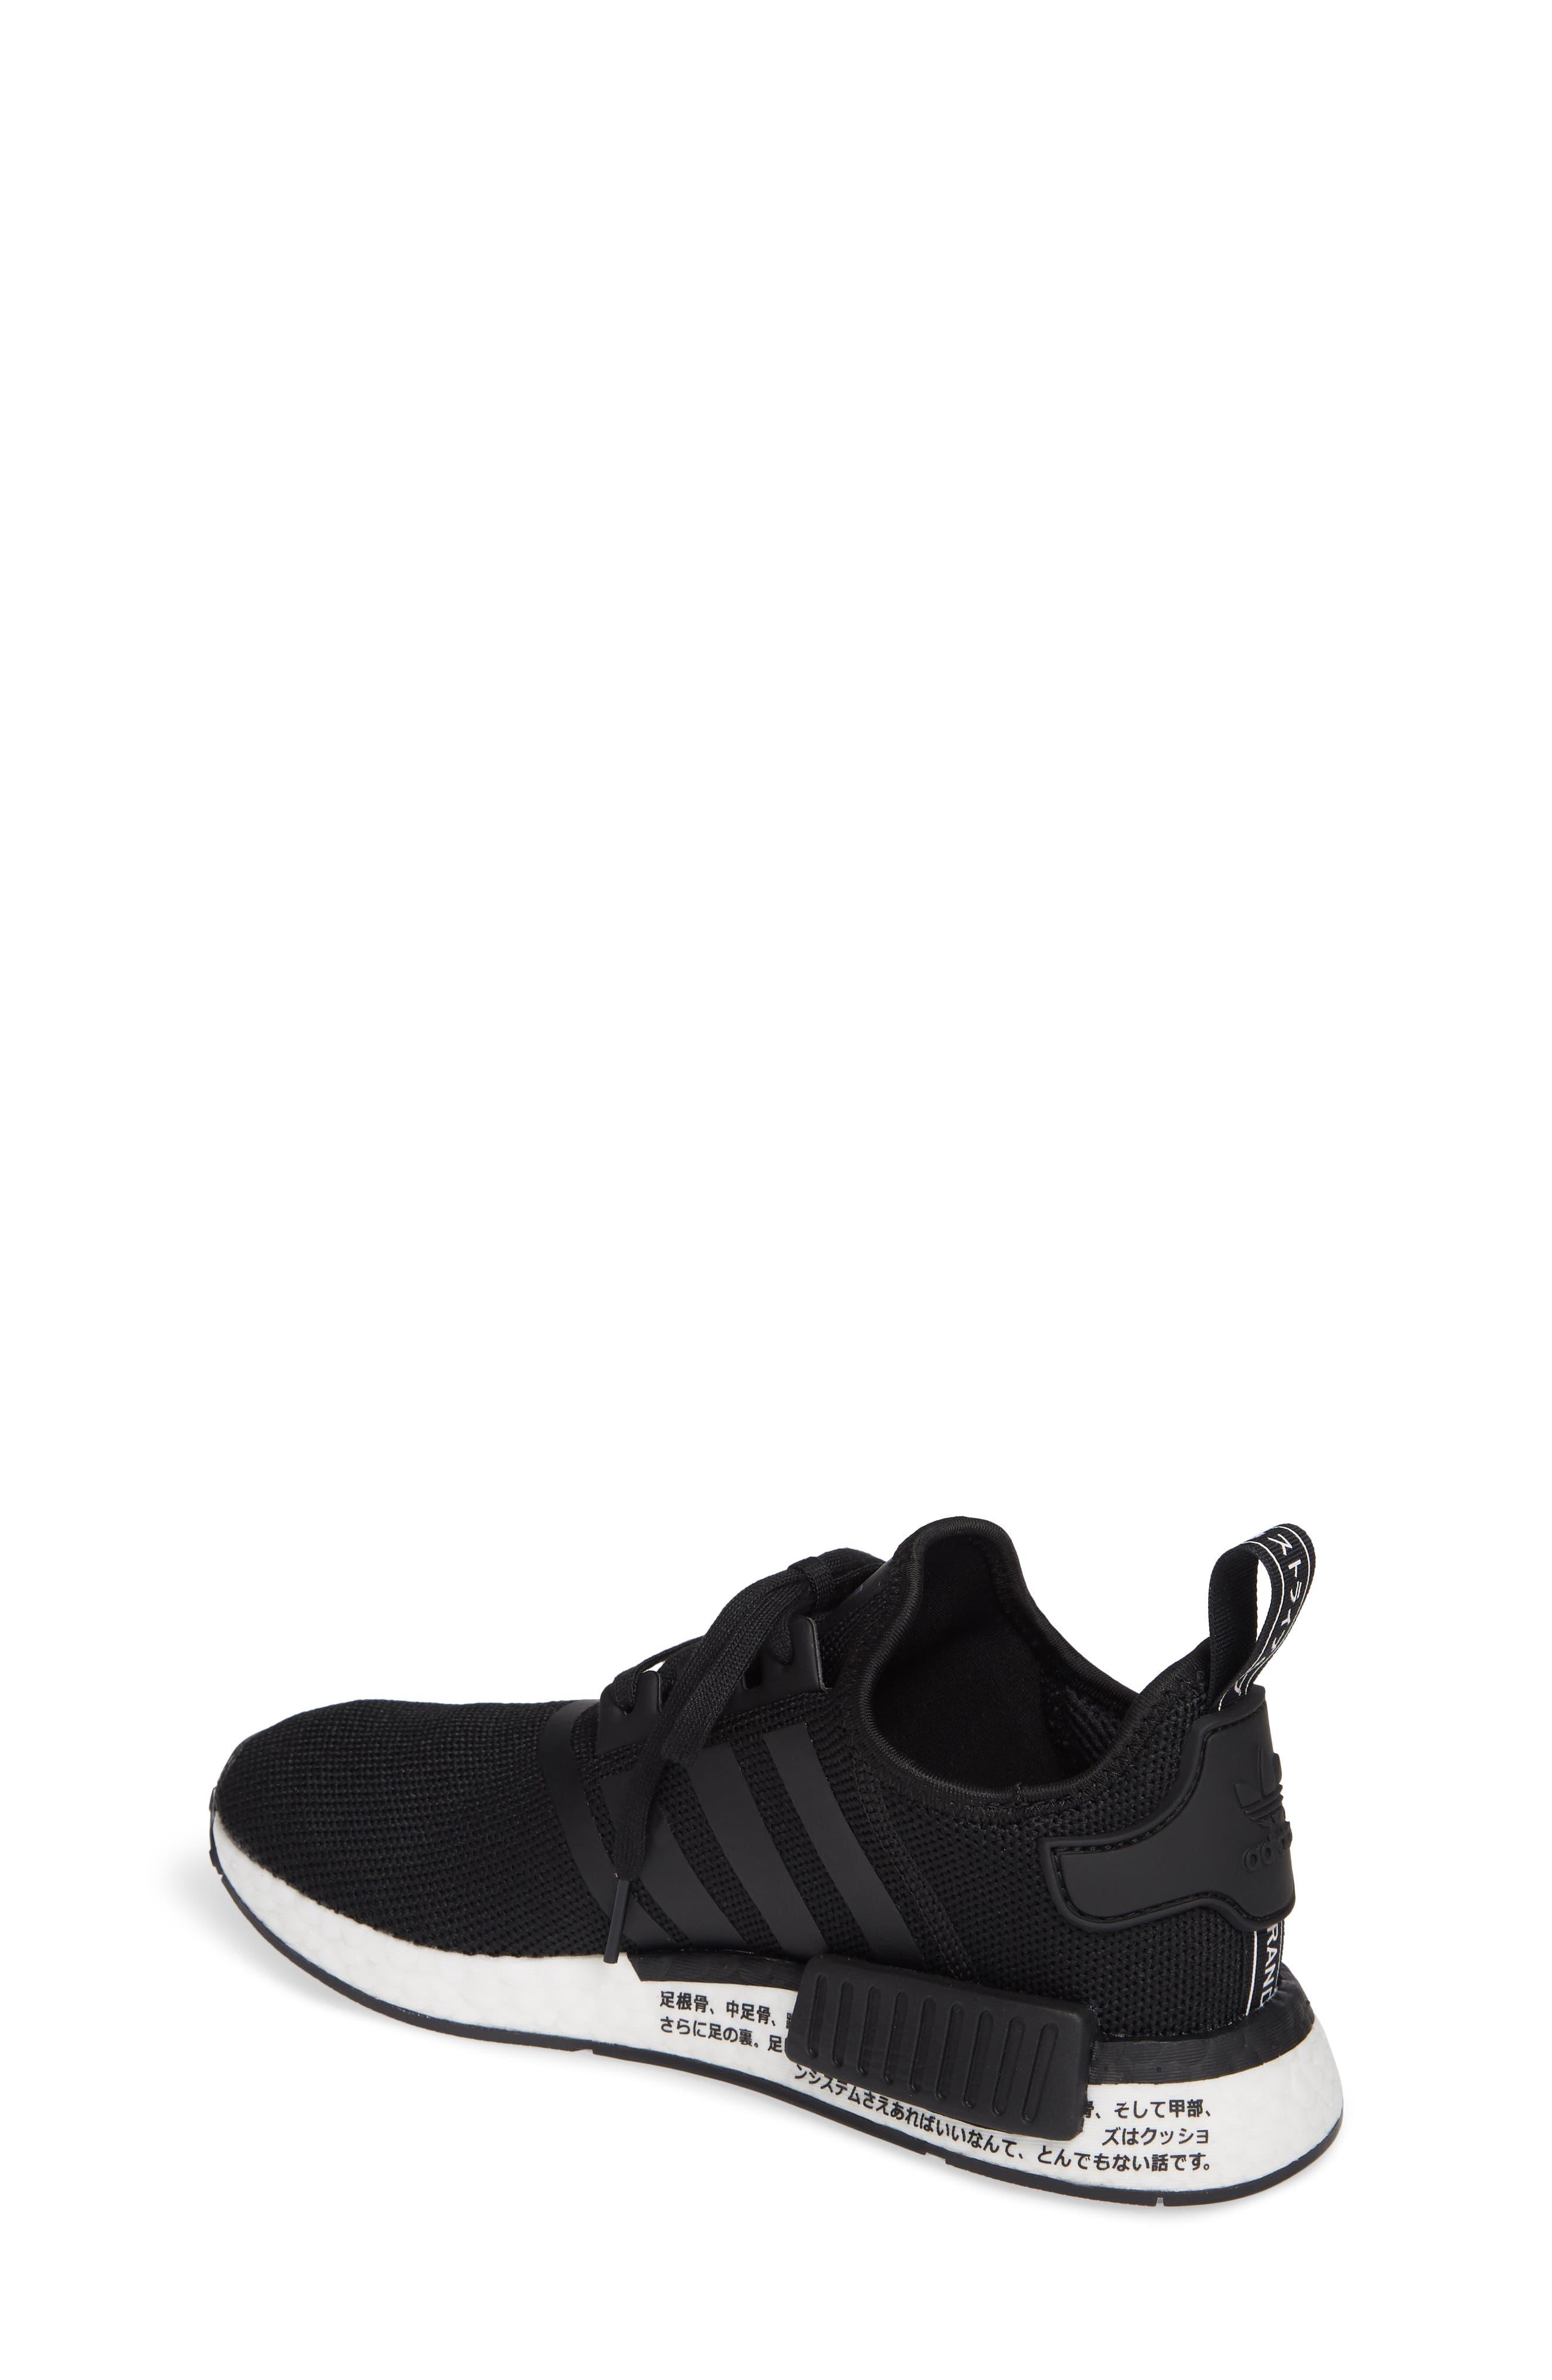 NMD R1 Sneaker,                             Alternate thumbnail 2, color,                             CORE BLACK/ BLACK/ ORCHID TINT